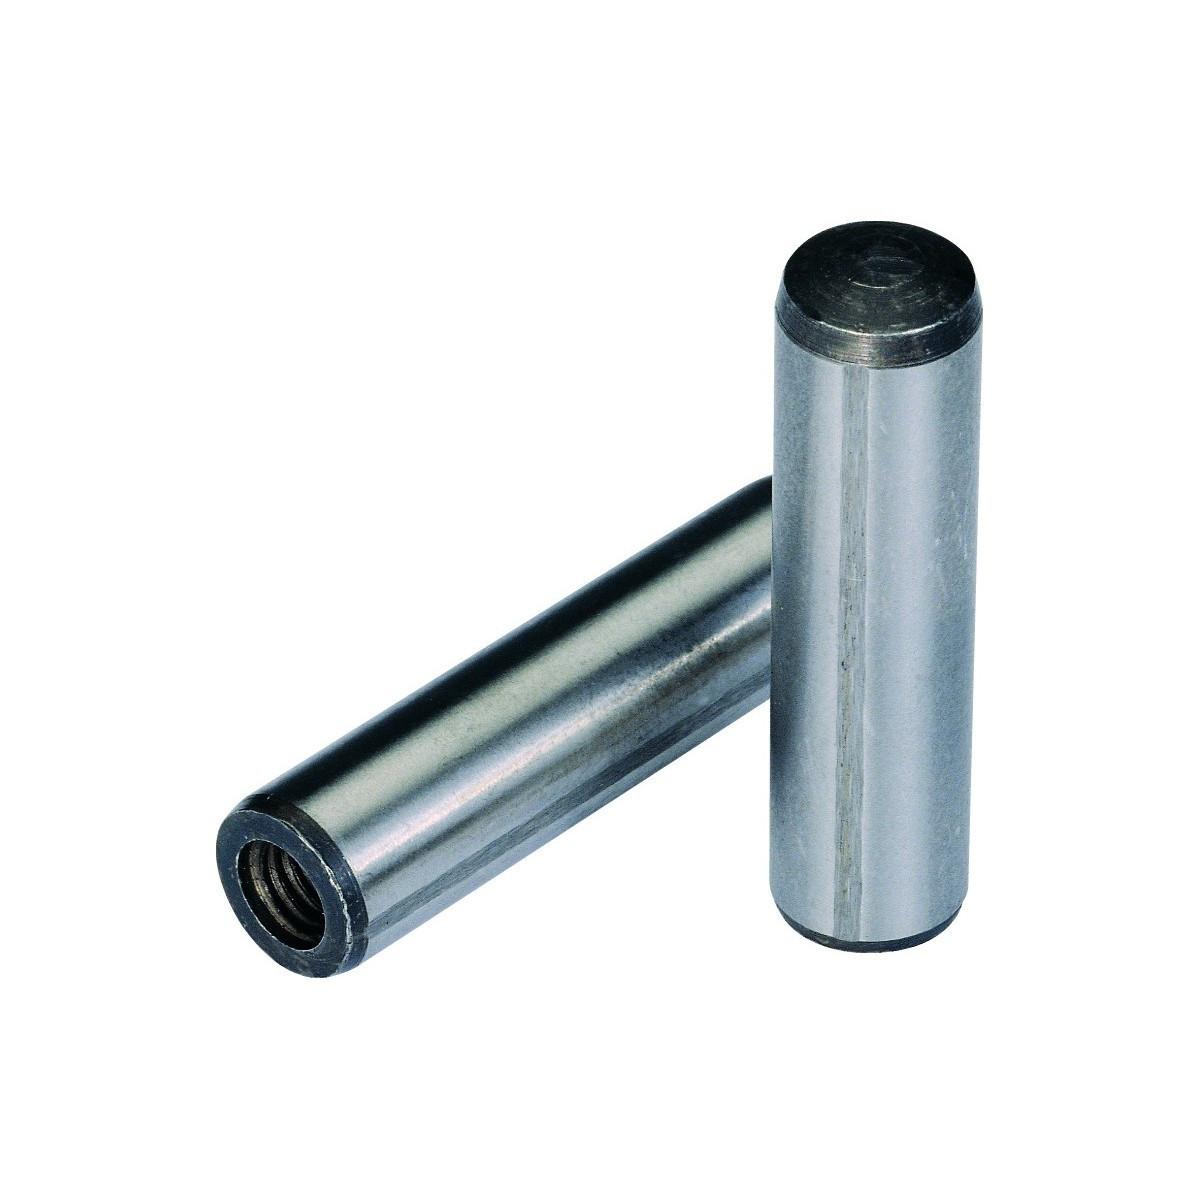 Штифт цилиндрический MMG  DIN 7979D M8 х 40 Класс 10.9 (Фосфат) 1 шт